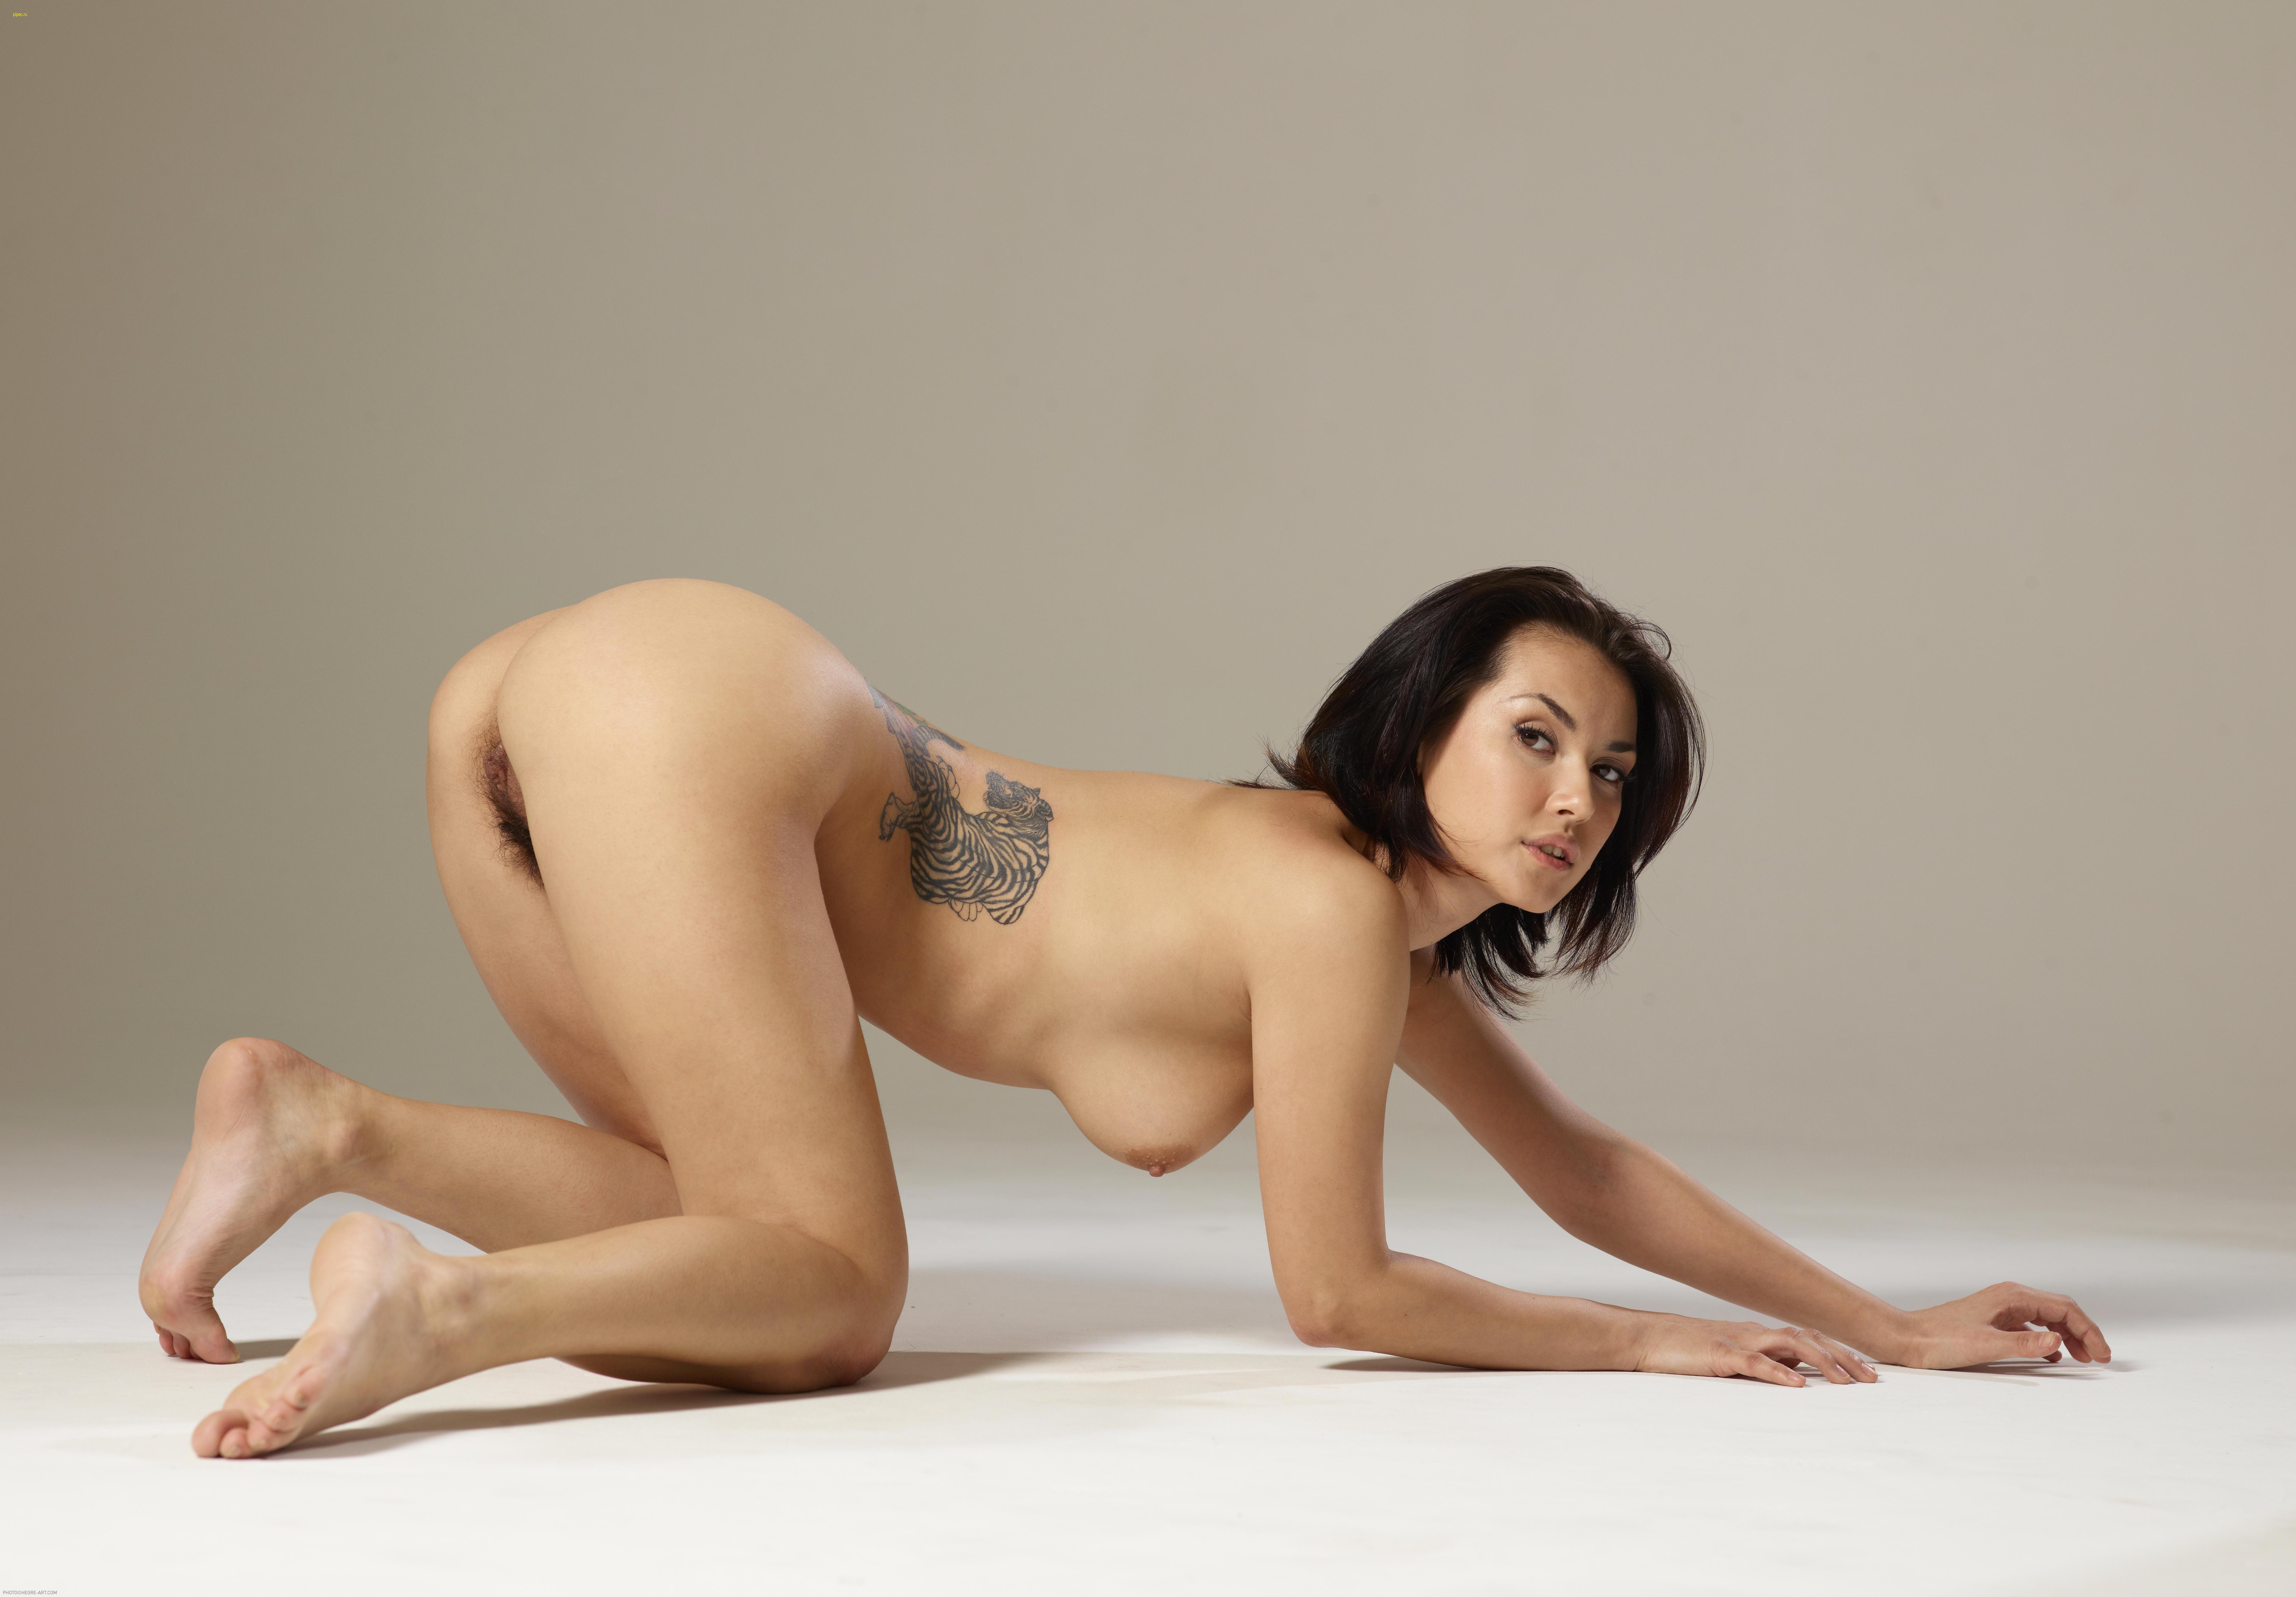 Retro nudist women